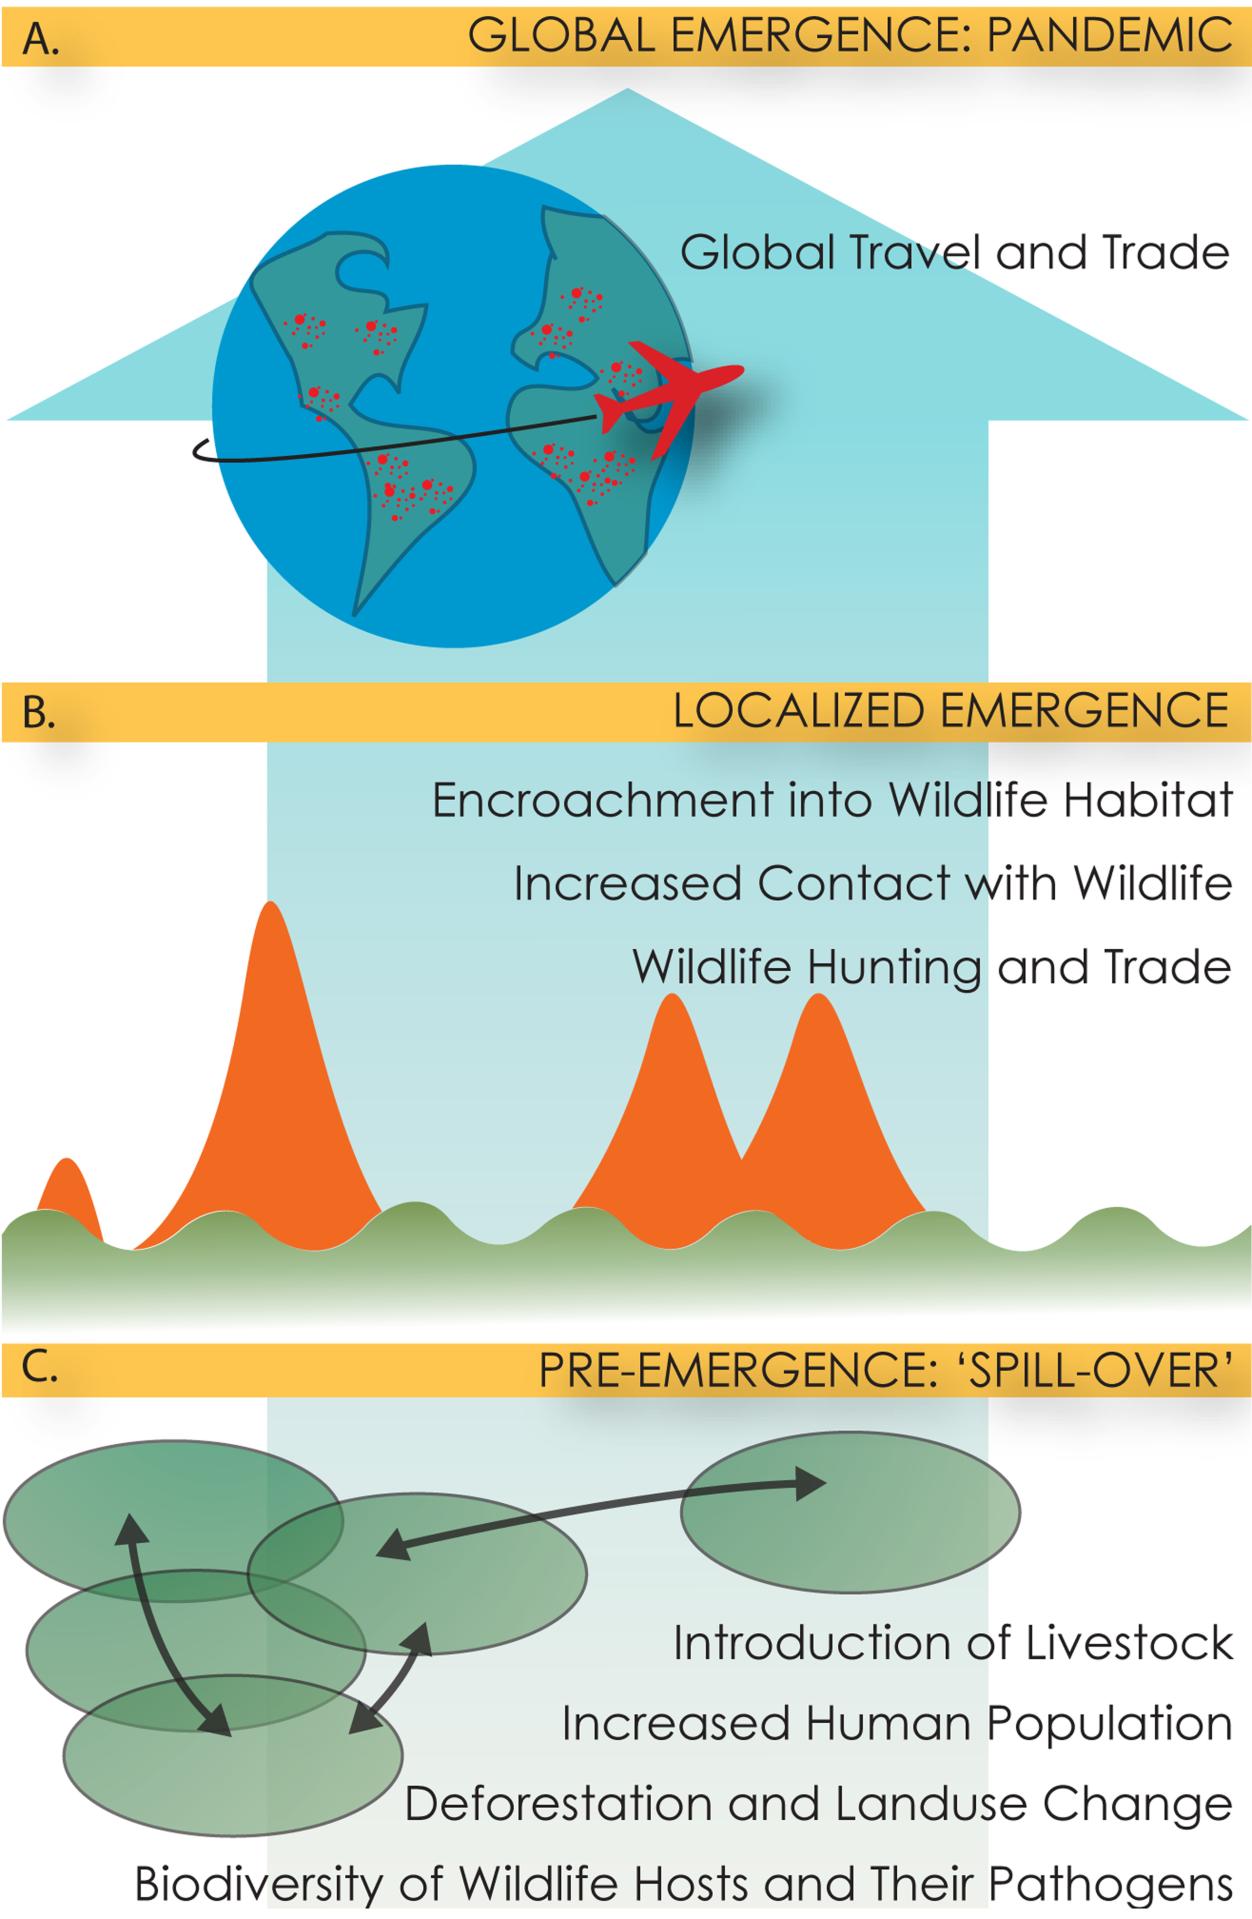 Figurative description of the multi-scale, multi-step process of pandemic emergence.